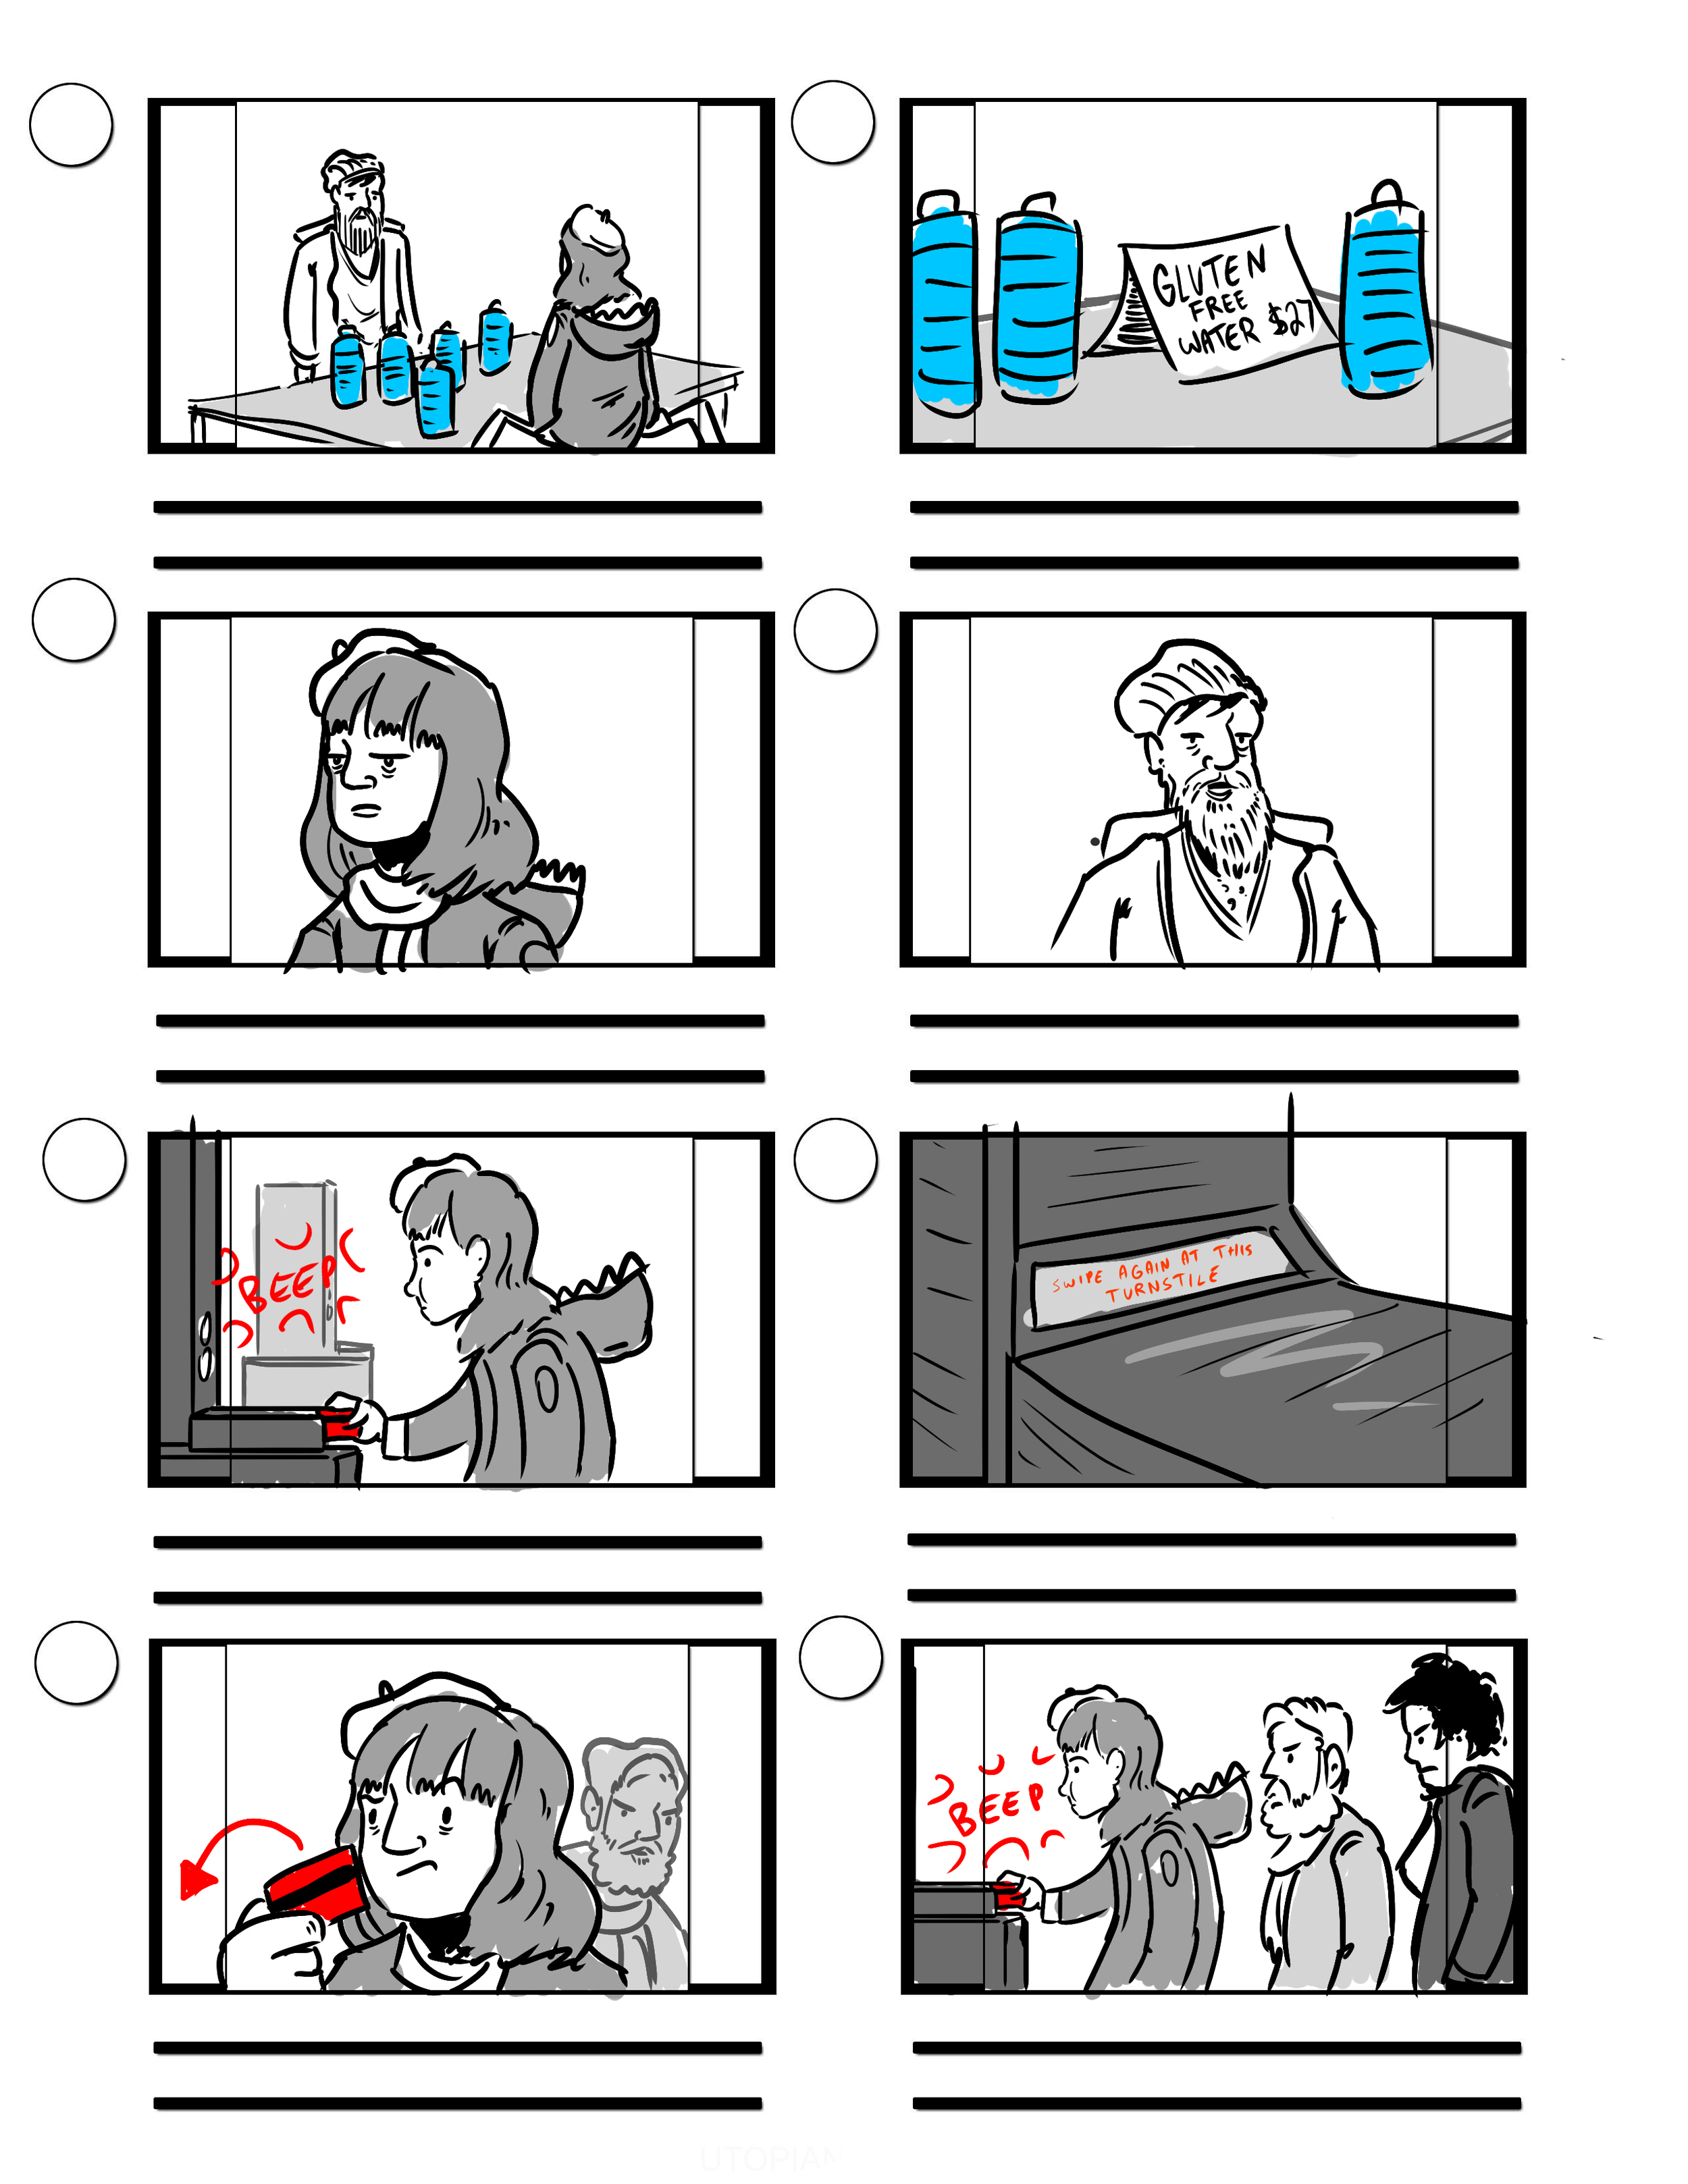 Seamless ThatGirl storyboard3.jpg